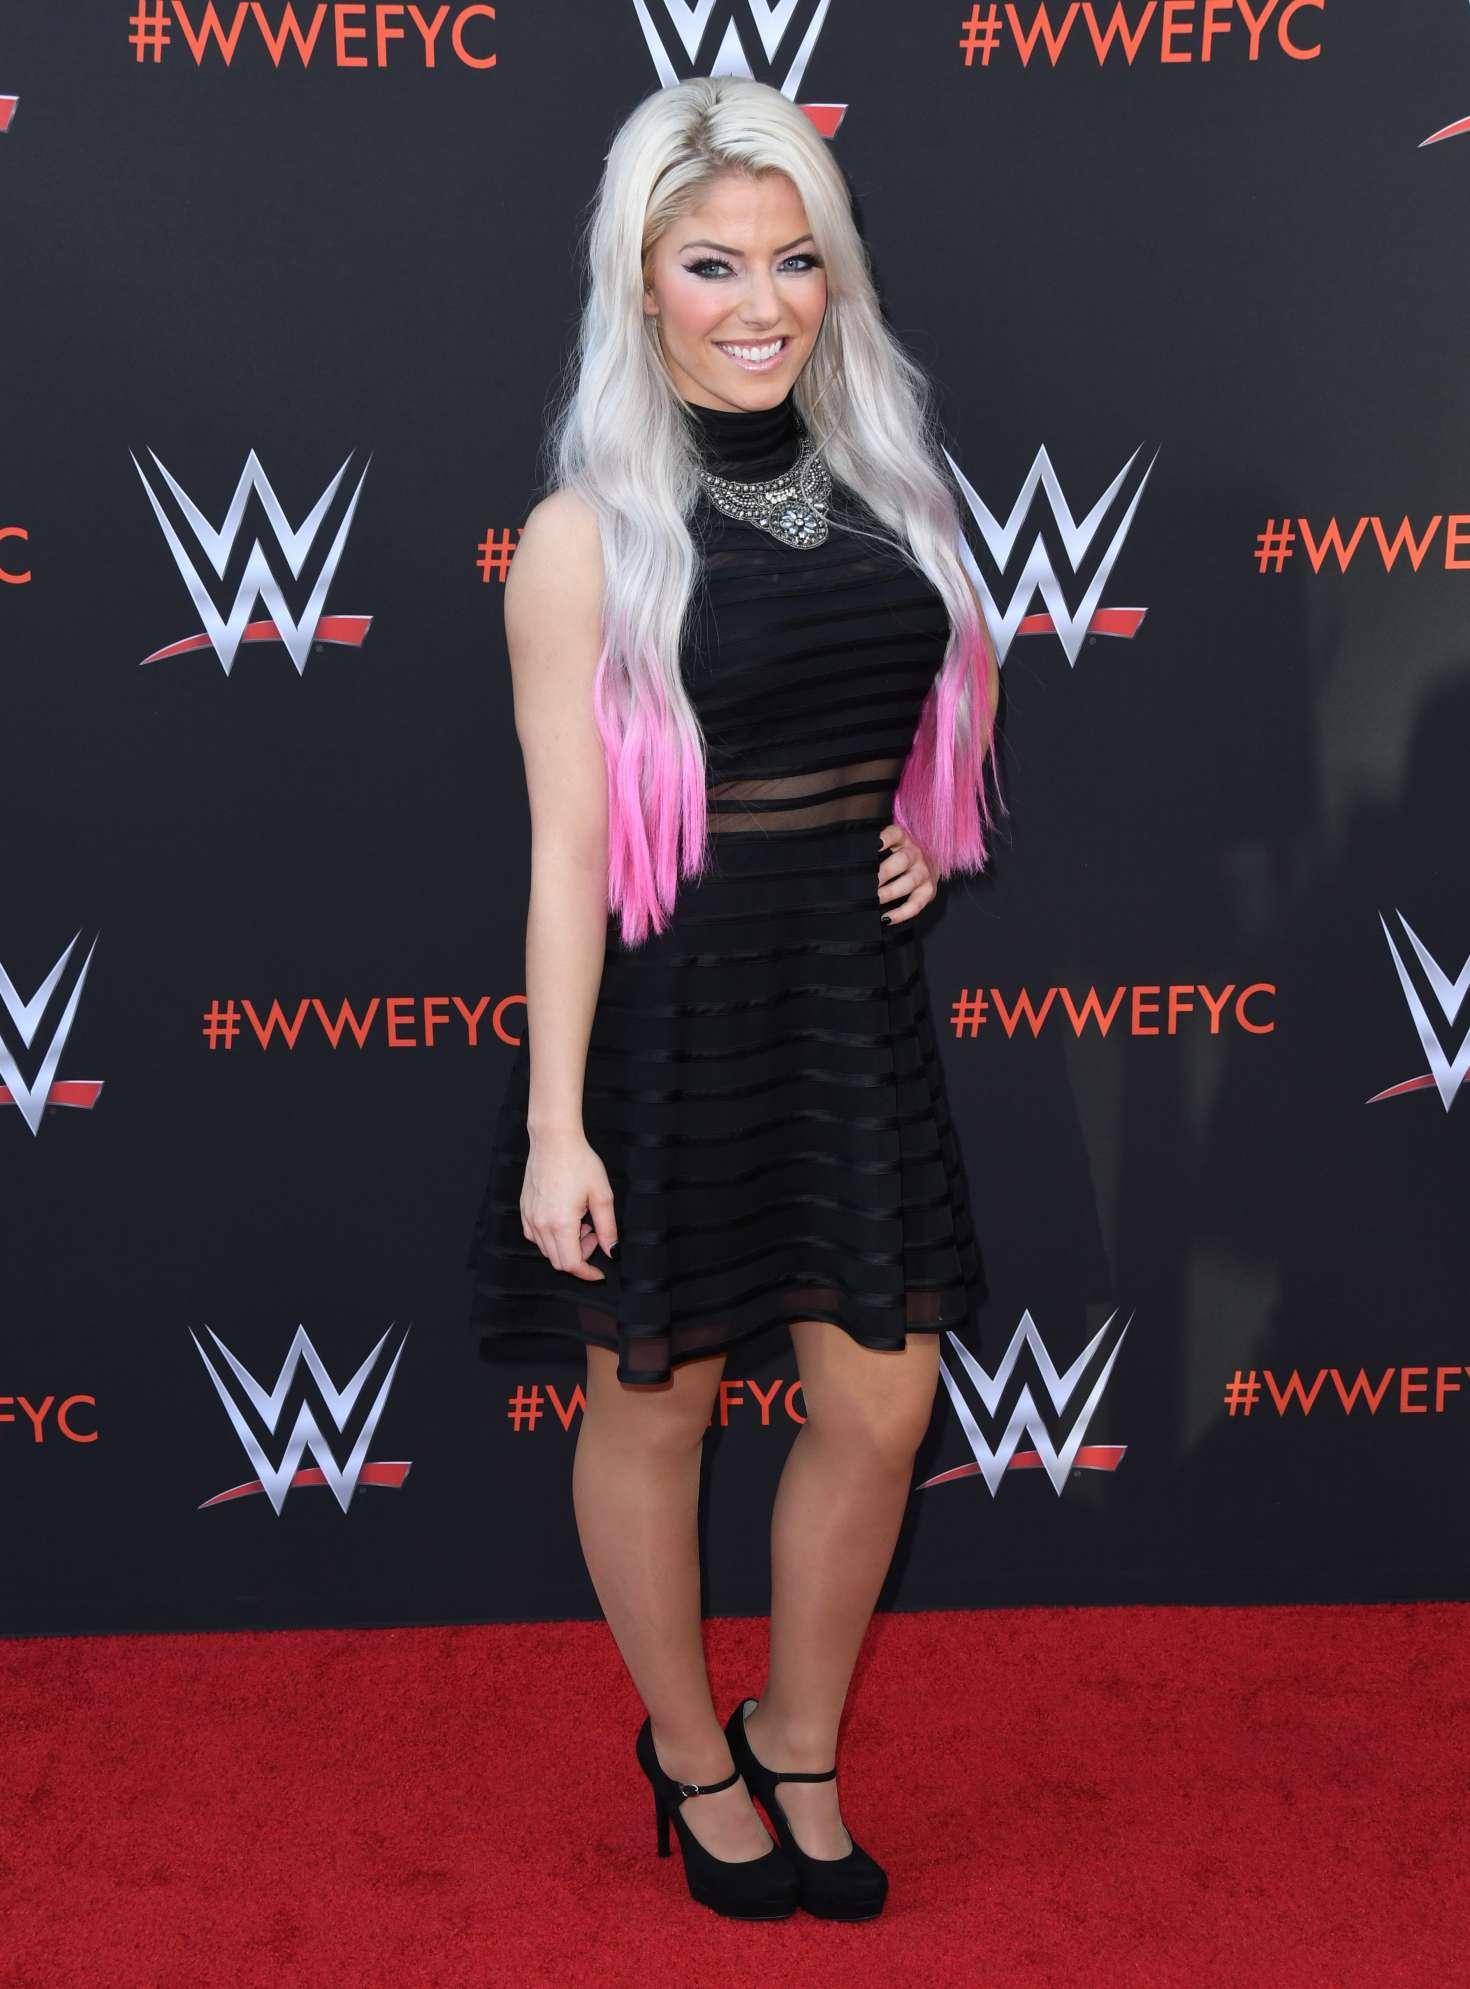 Alexa Bliss 2018 : Alexa Bliss: WWE FYC Event -01